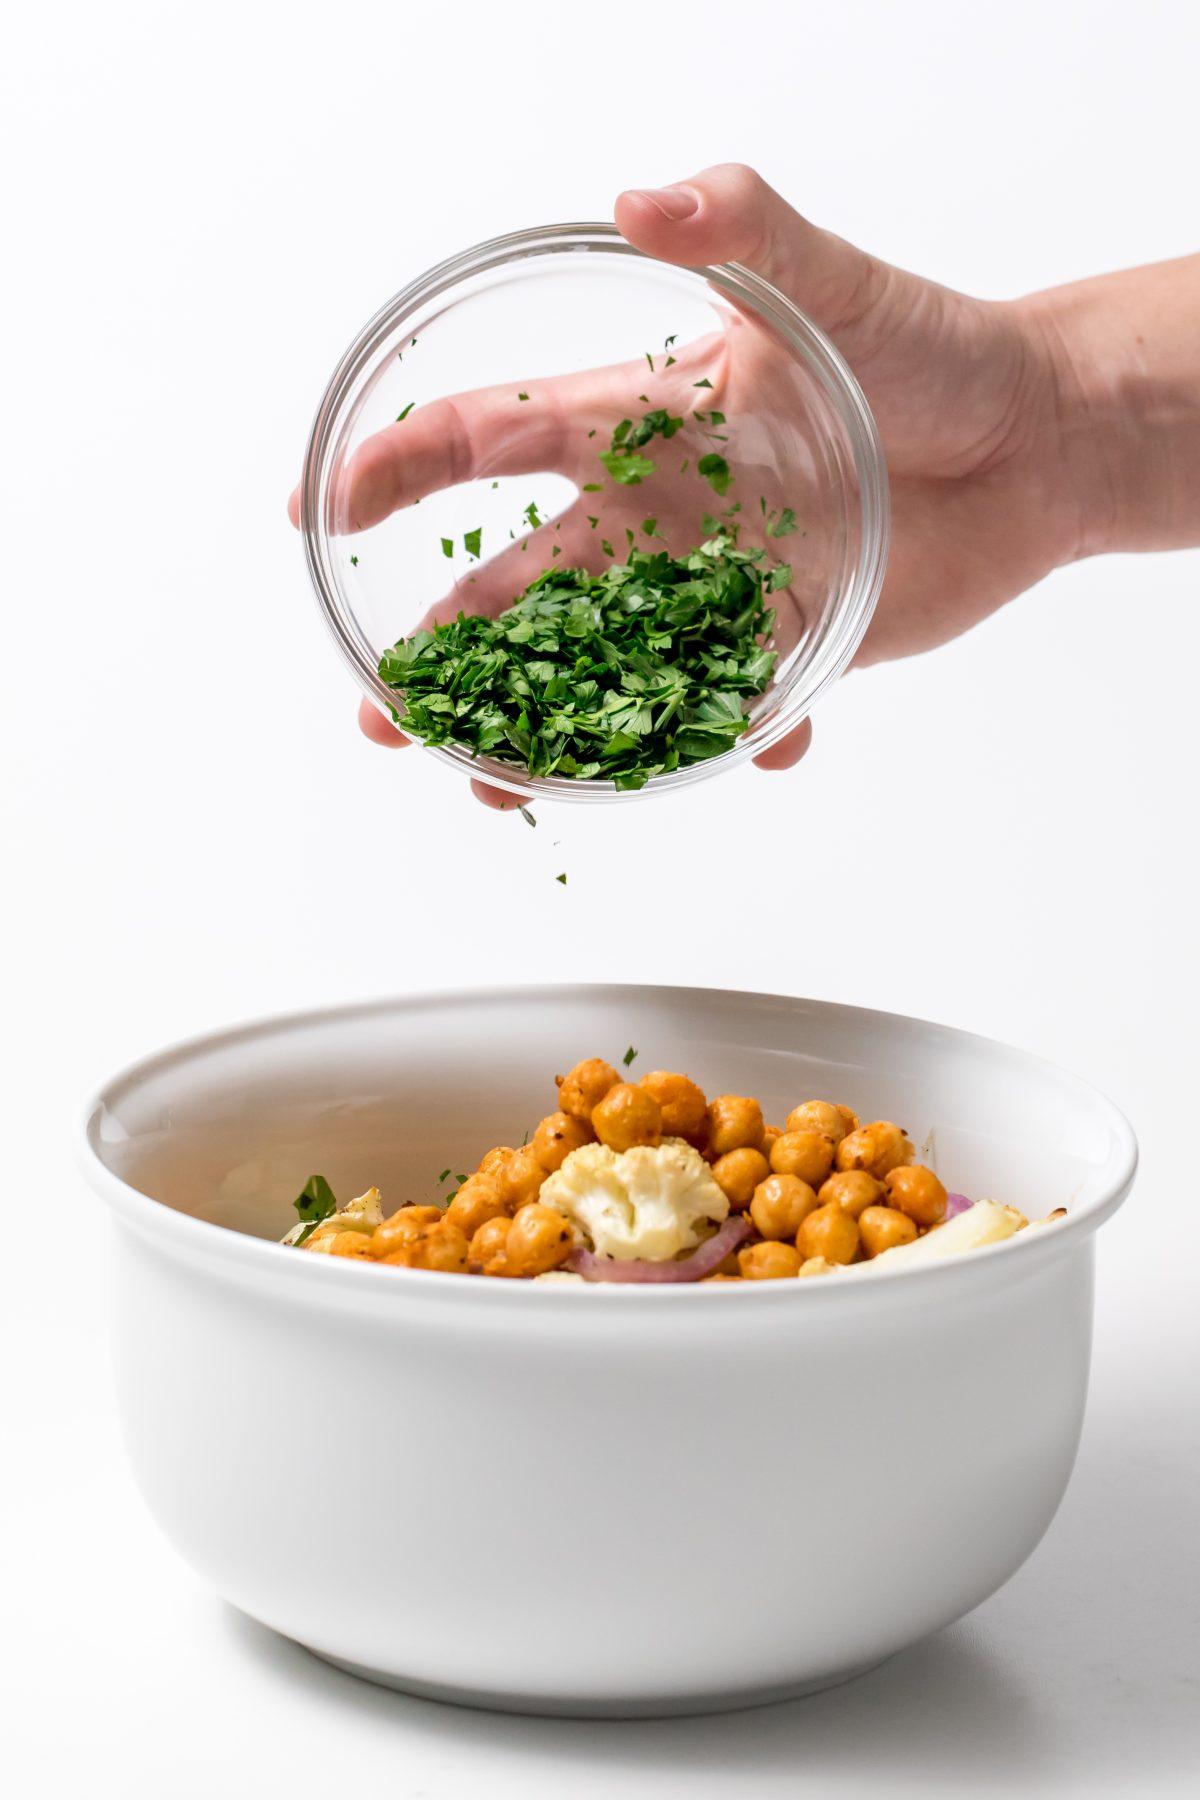 5D4B3776 - Cauliflower salad with Lemon tahini dressing - Assemble the salad